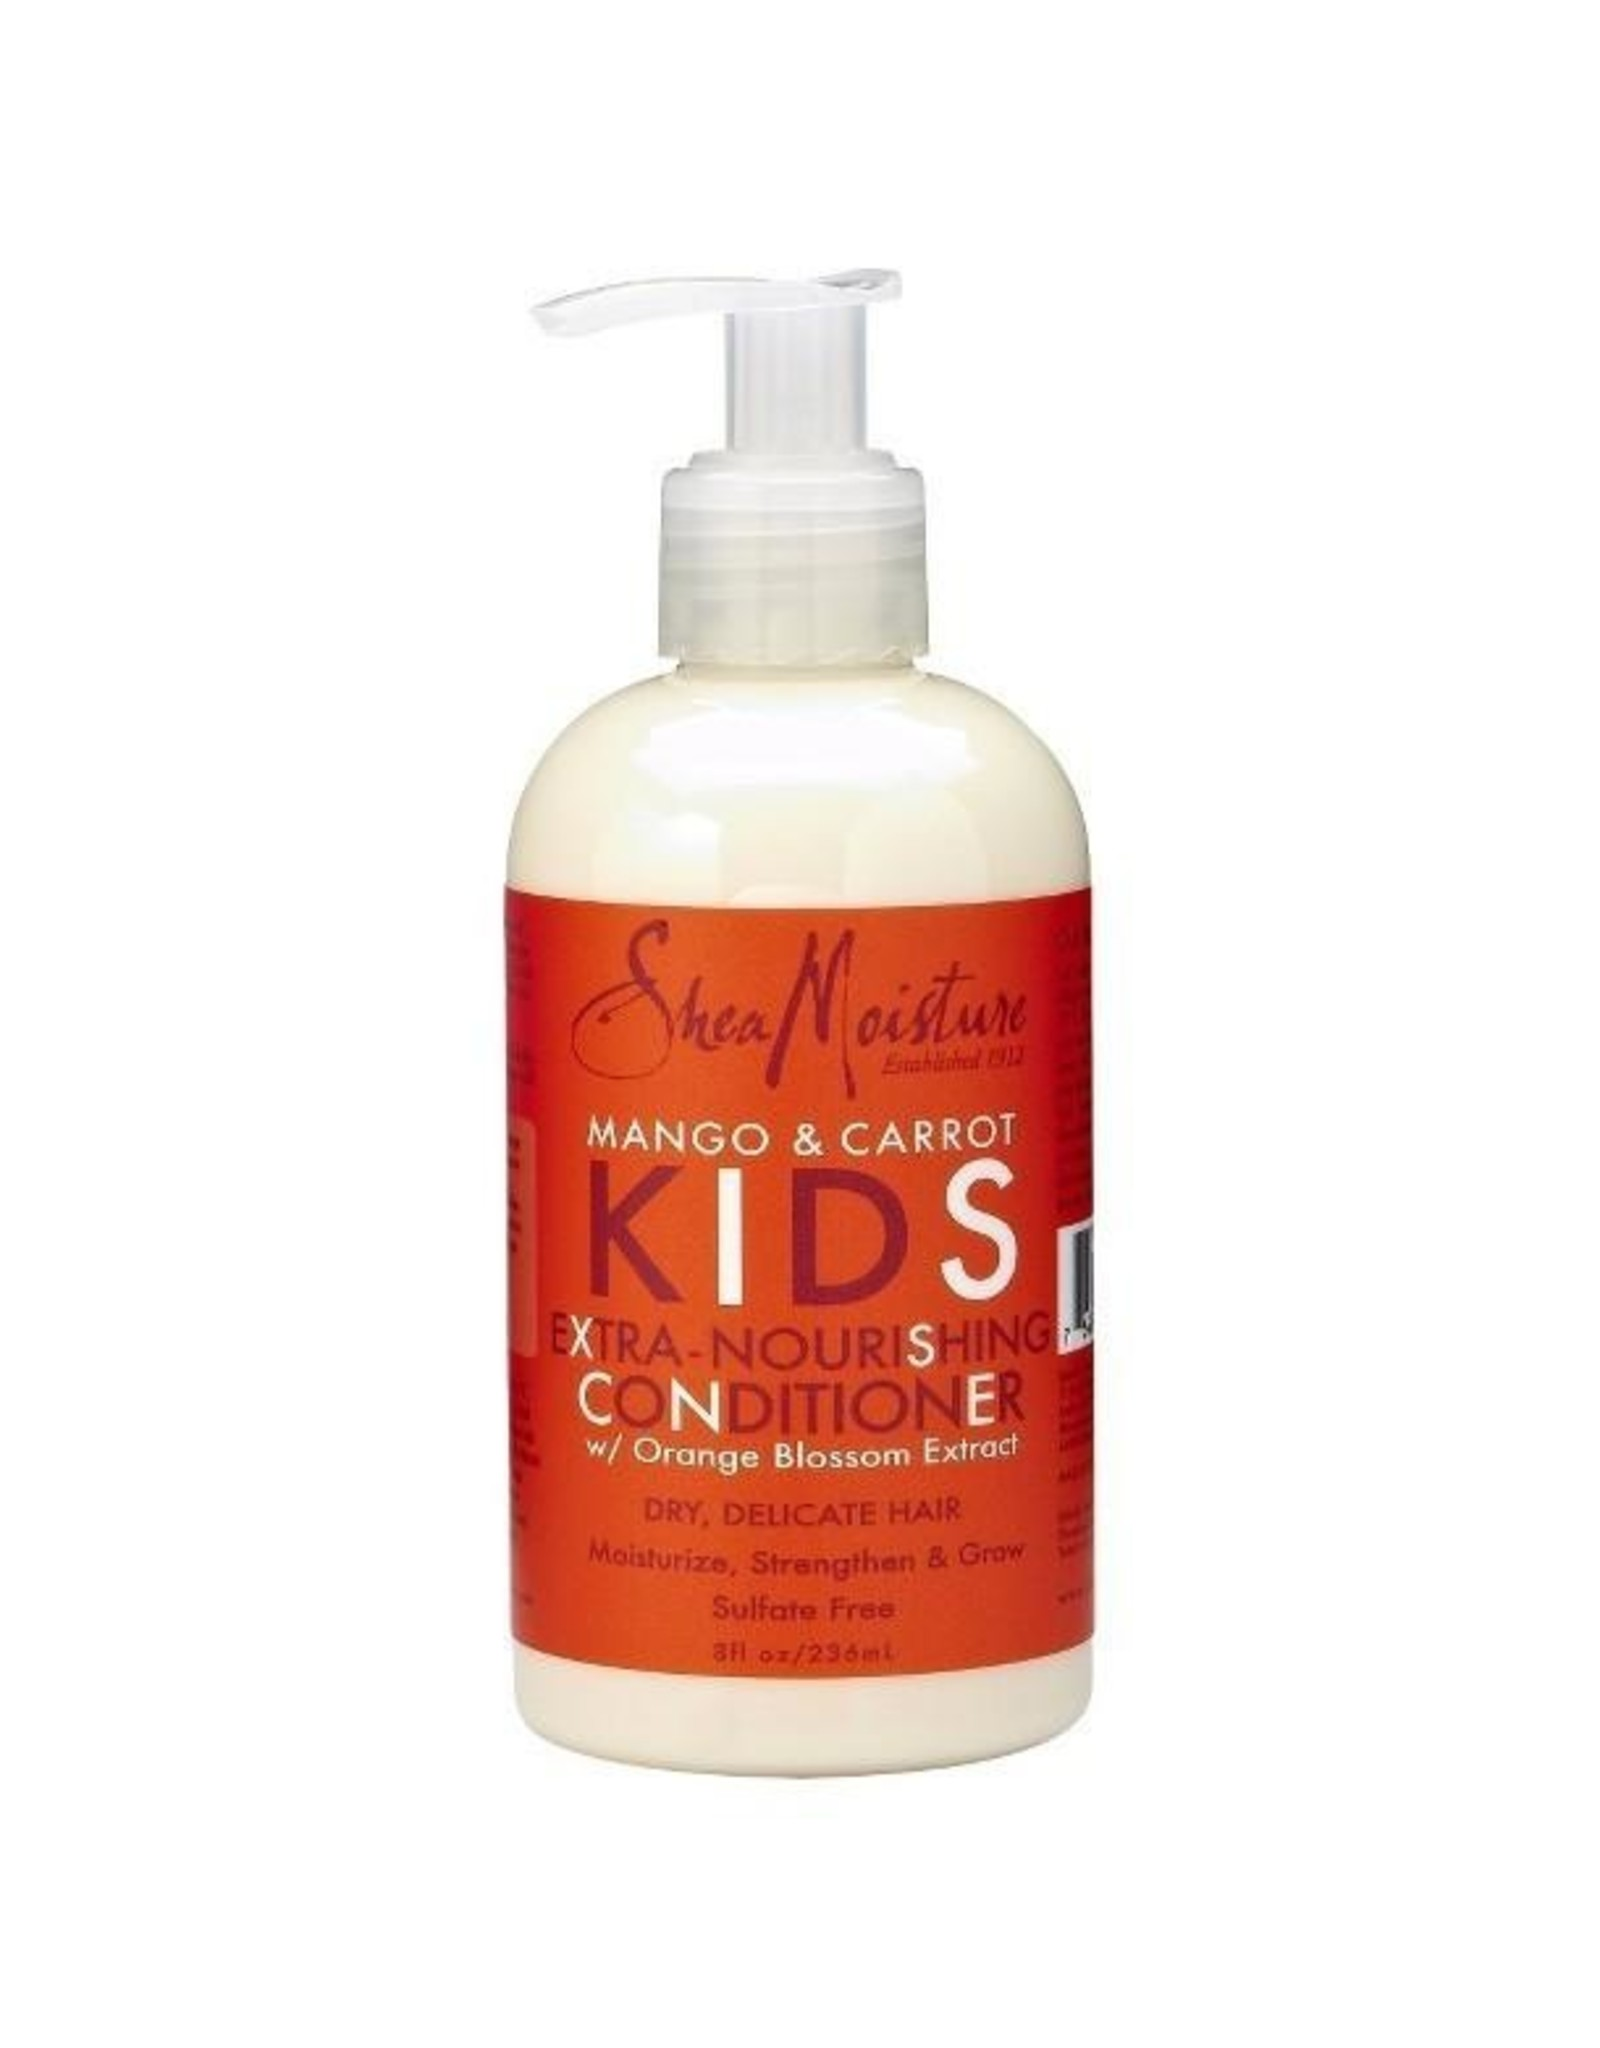 Shea Moisture KIDS Mango & Carrot Conditioner